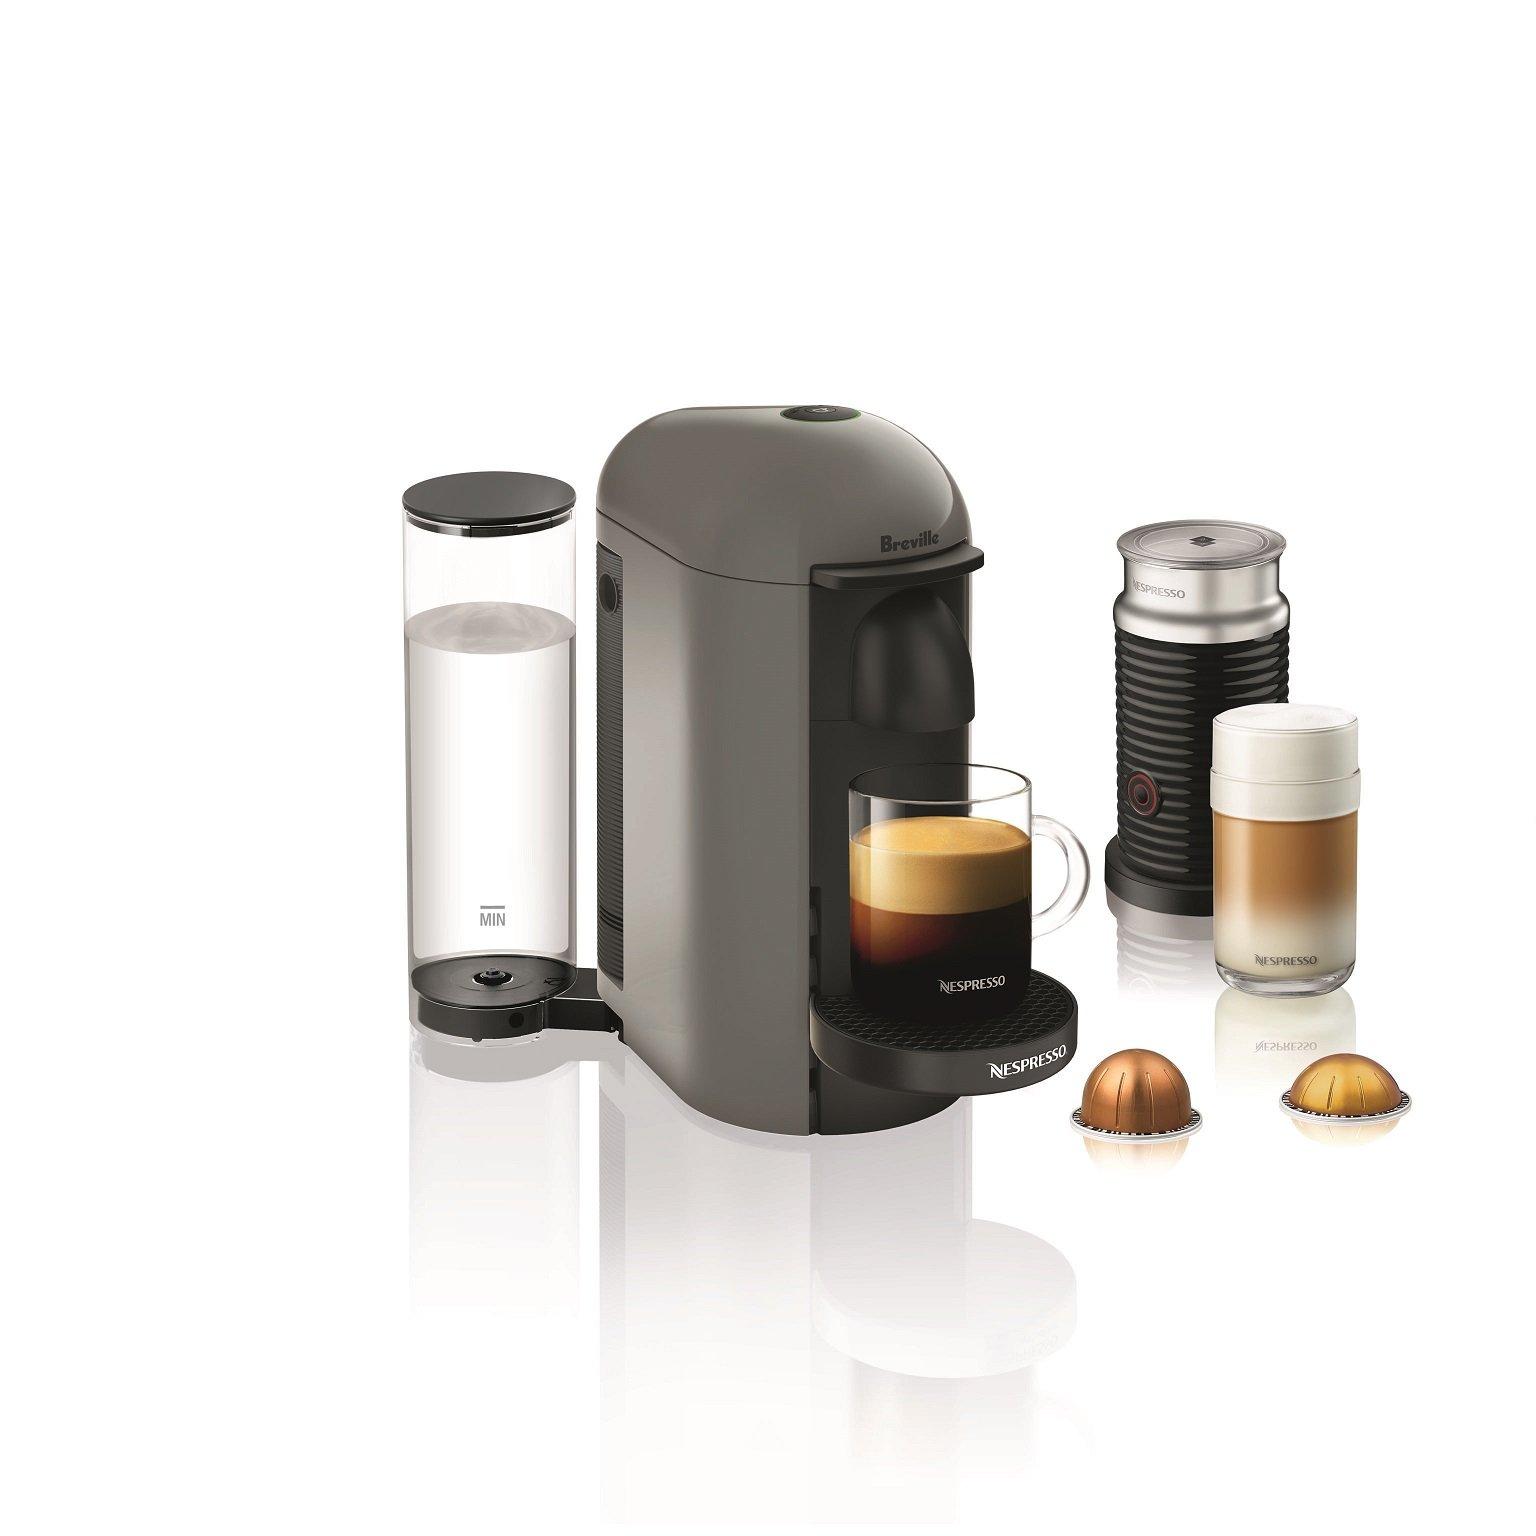 Nespresso VertuoPlus Coffee and Espresso Machine Bundle with Aeroccino Milk Frother by Breville, Grey